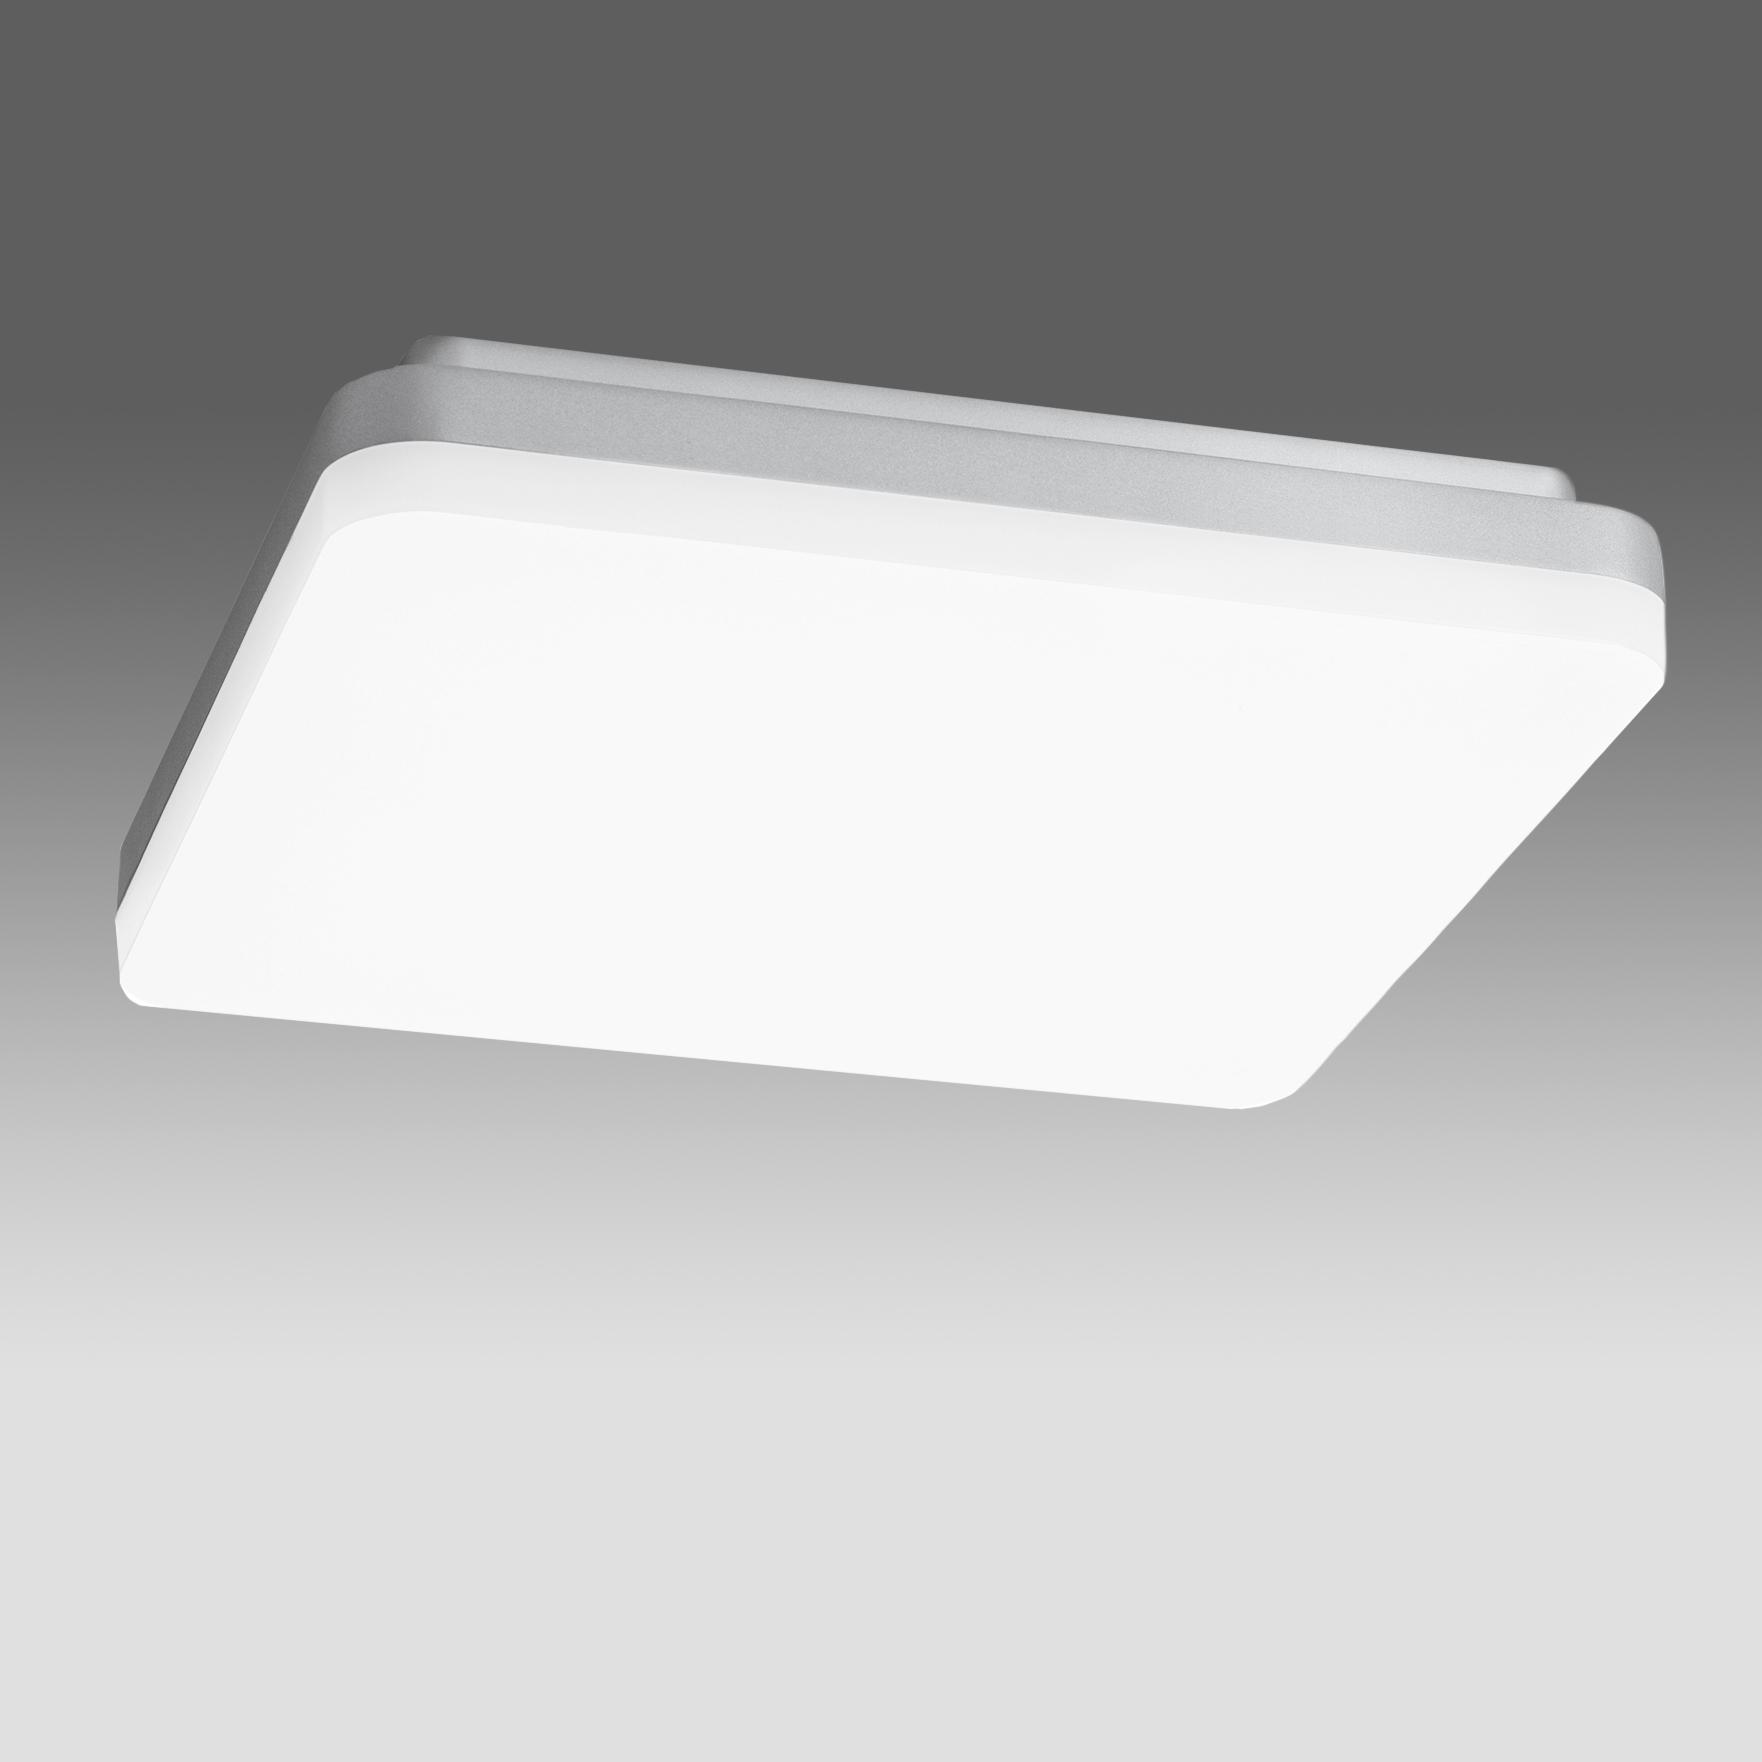 1 Stk Elegance Square III 27W 2800lm 4000K Sensor IP20 silber LILE0044--